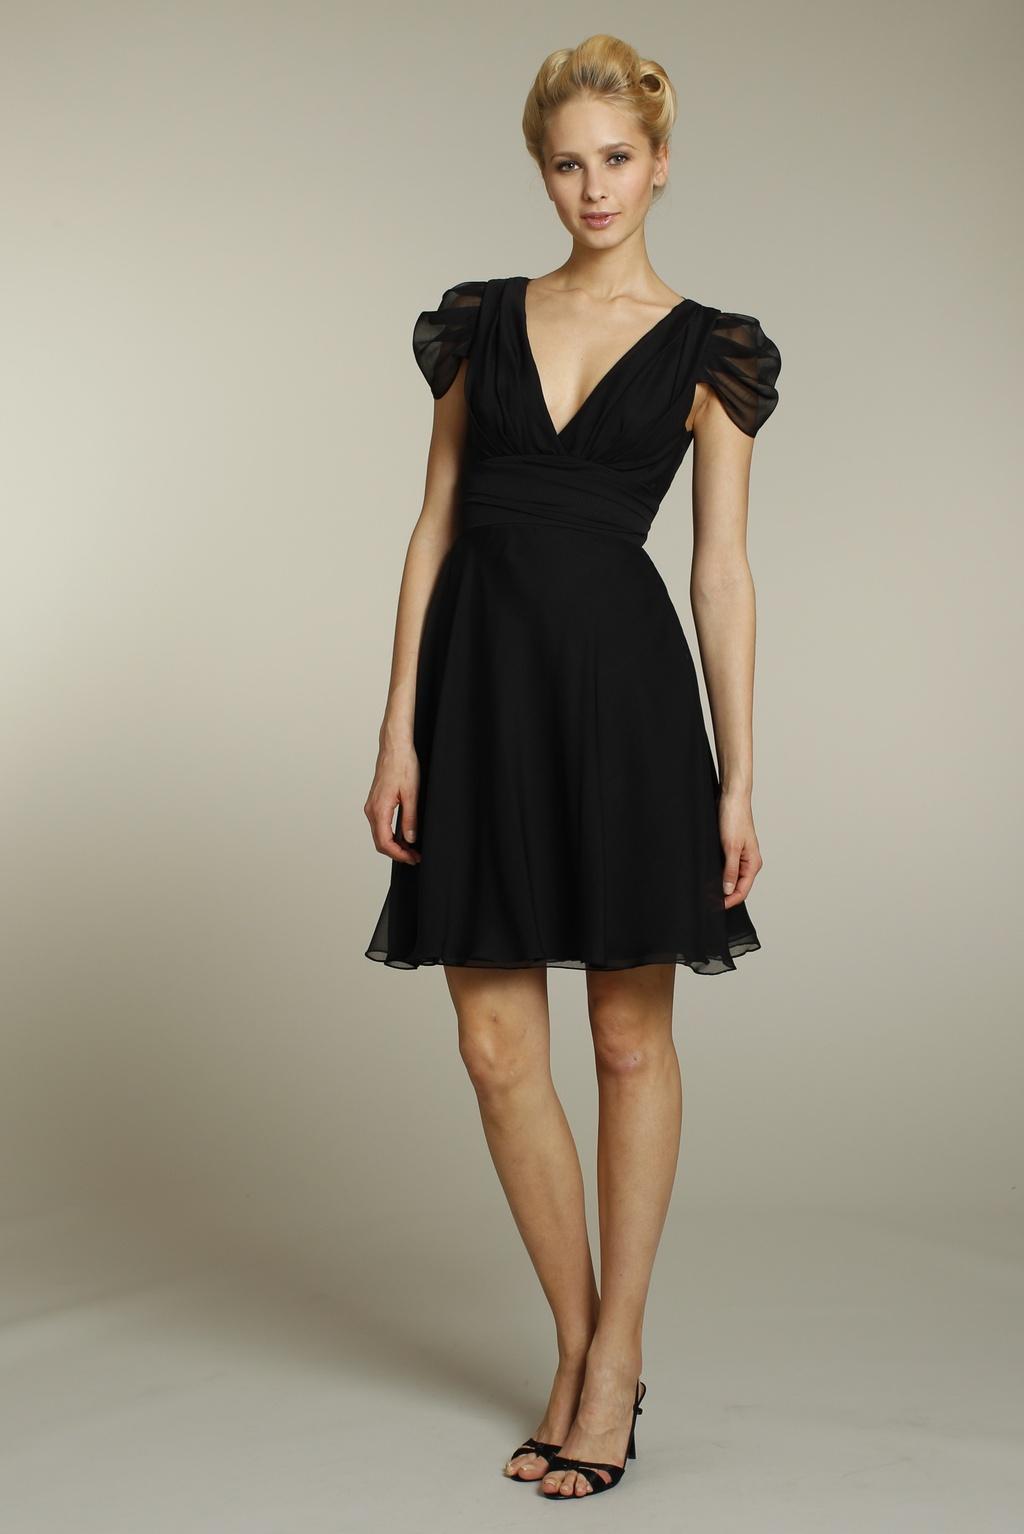 Bridesmaids-dresses-jlm-fall-2011-gowns-black-cap-sleeves.full